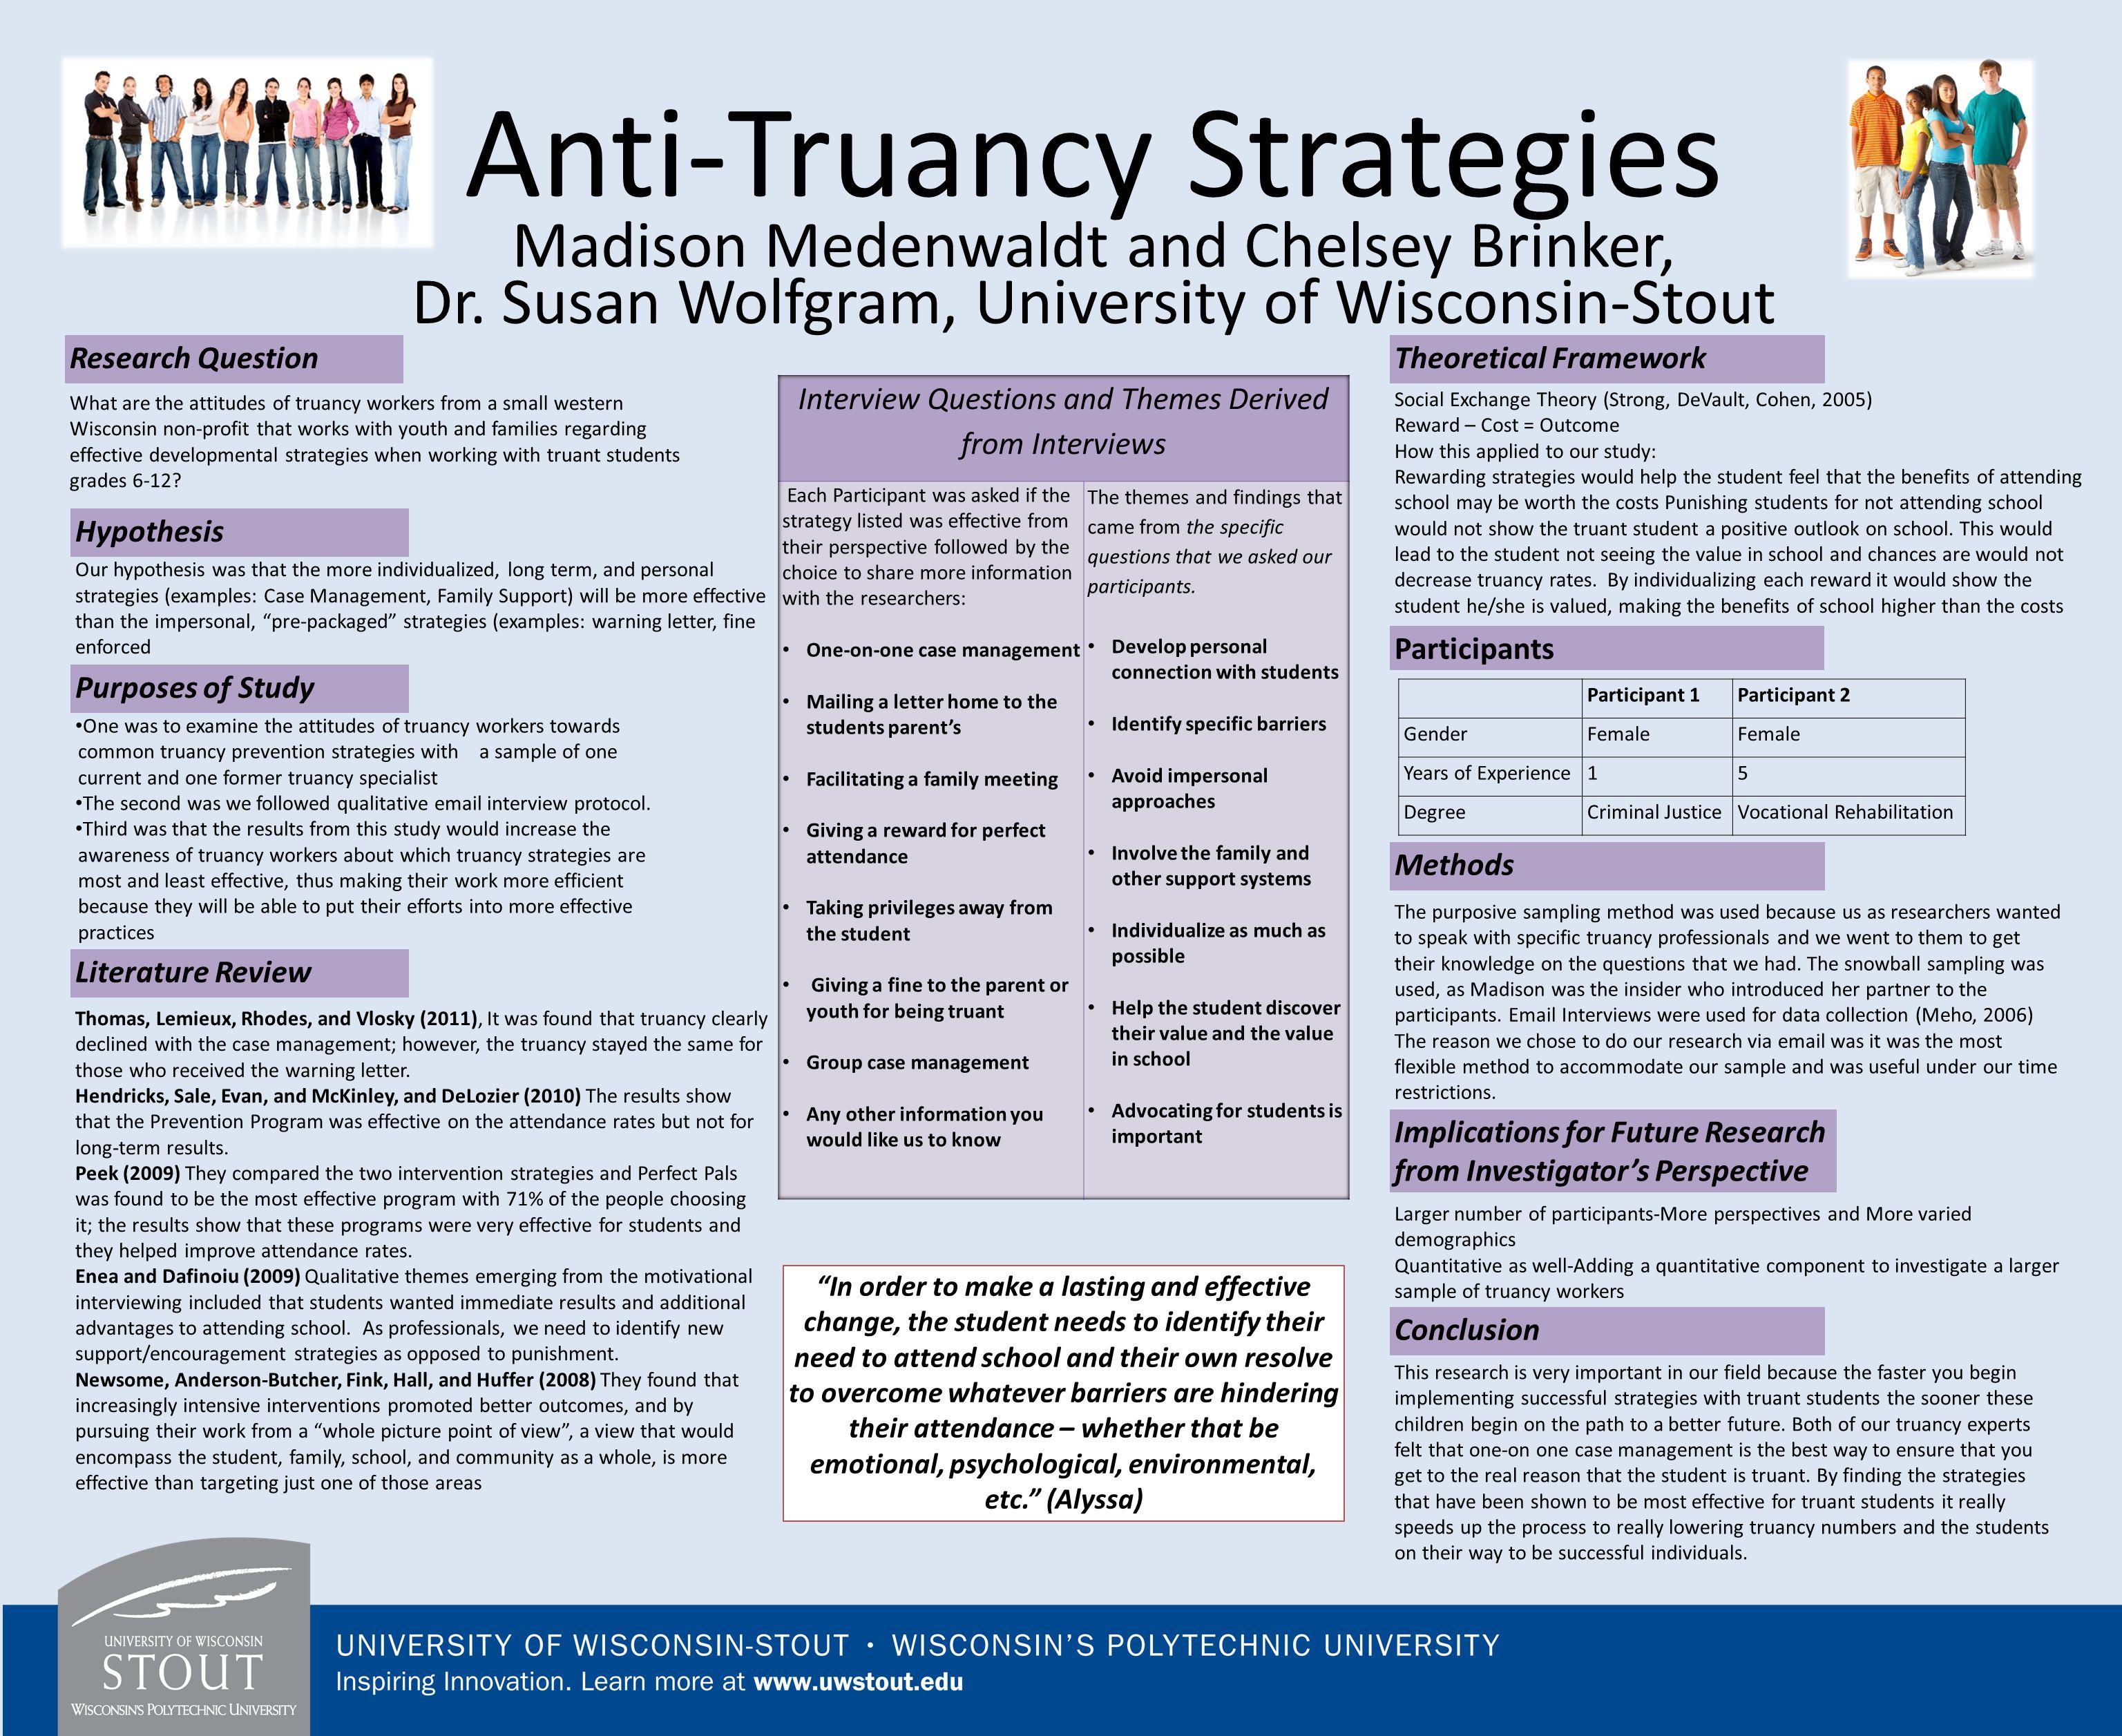 Anti-Truancy Strategies Madison Medenwaldt and Chelsey Brinker, Dr.